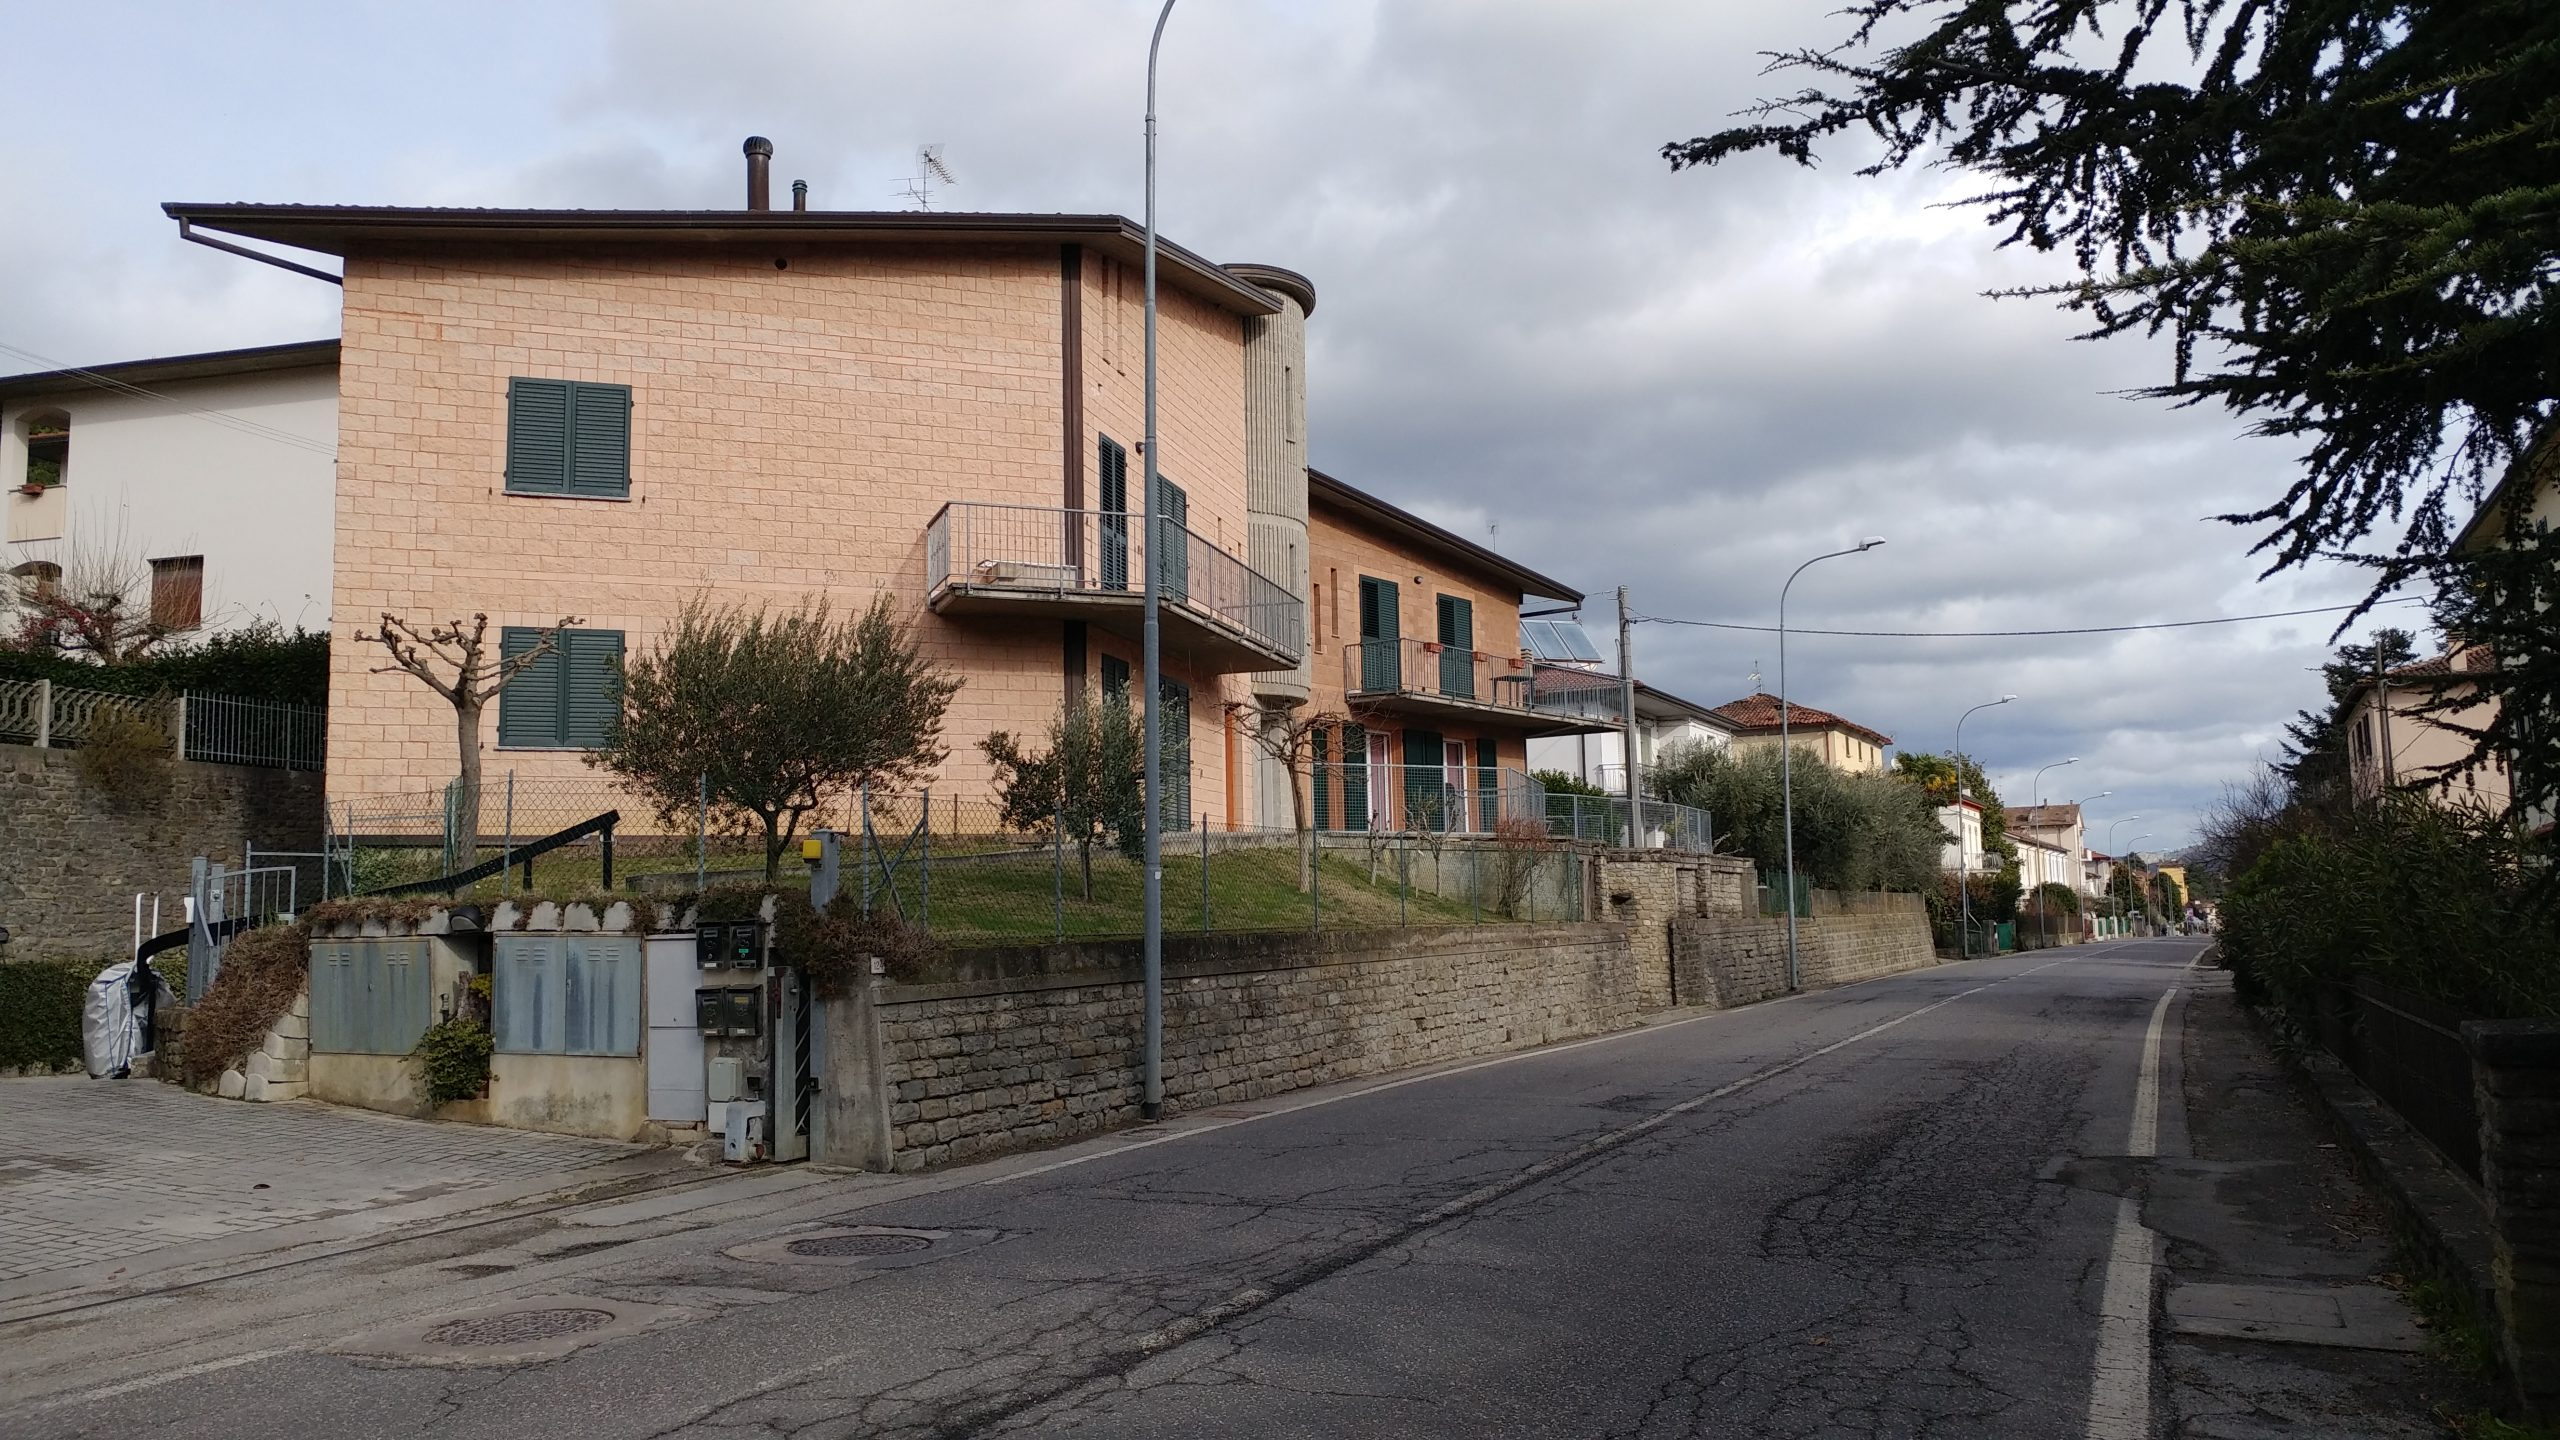 Vendesi appartamento Casola Valsenio € 68.000